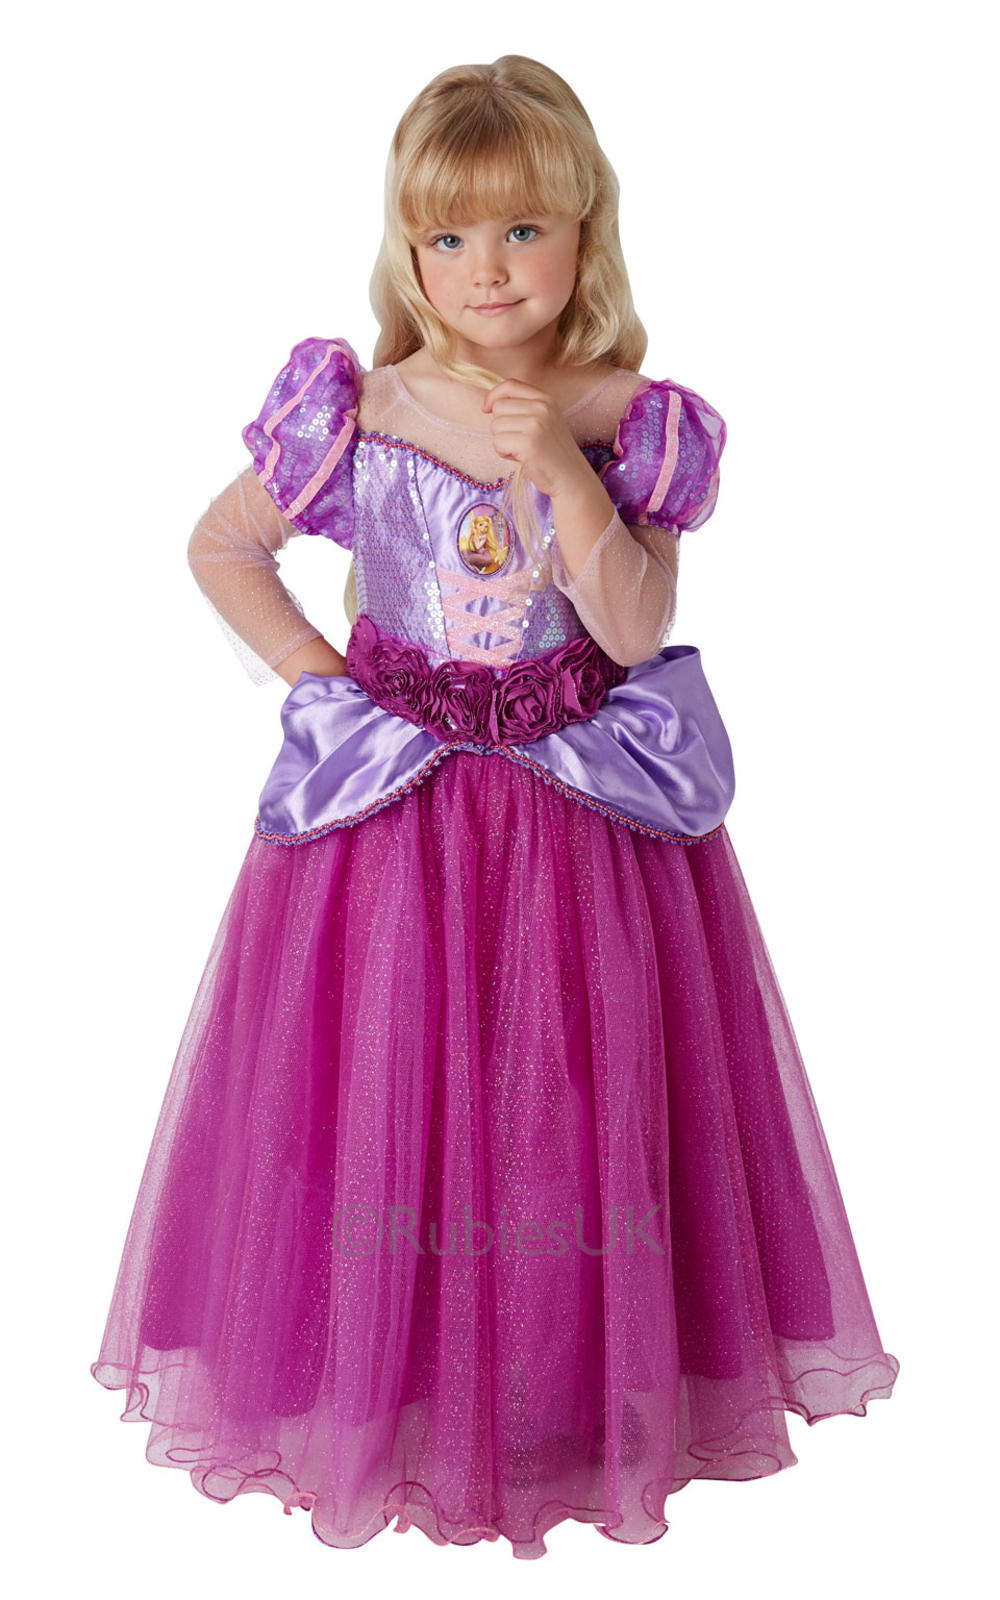 Premium Rapunzel Girls Fancy Dress Tangled Disney Princess Kids Costume Outfit